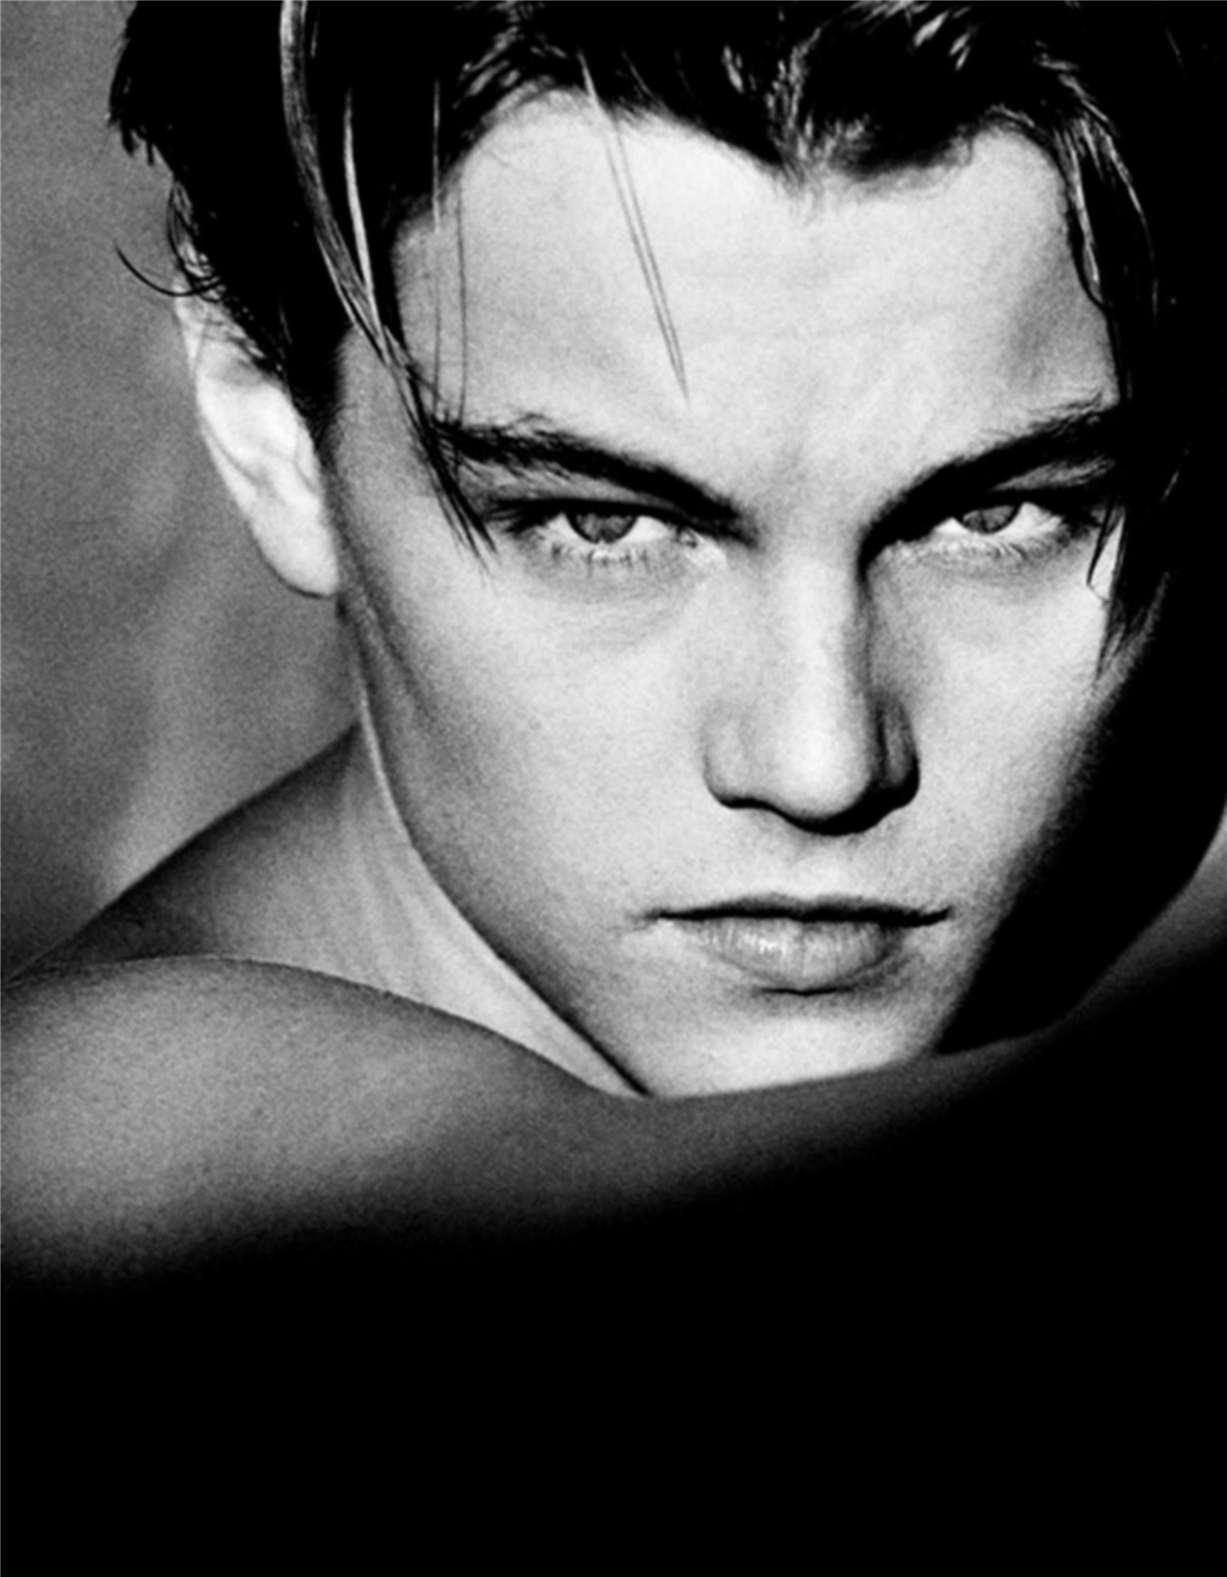 Leonardo DiCaprio / Леонардо ди Каприо - портрет фотографа Грега Гормана / Greg Gorman